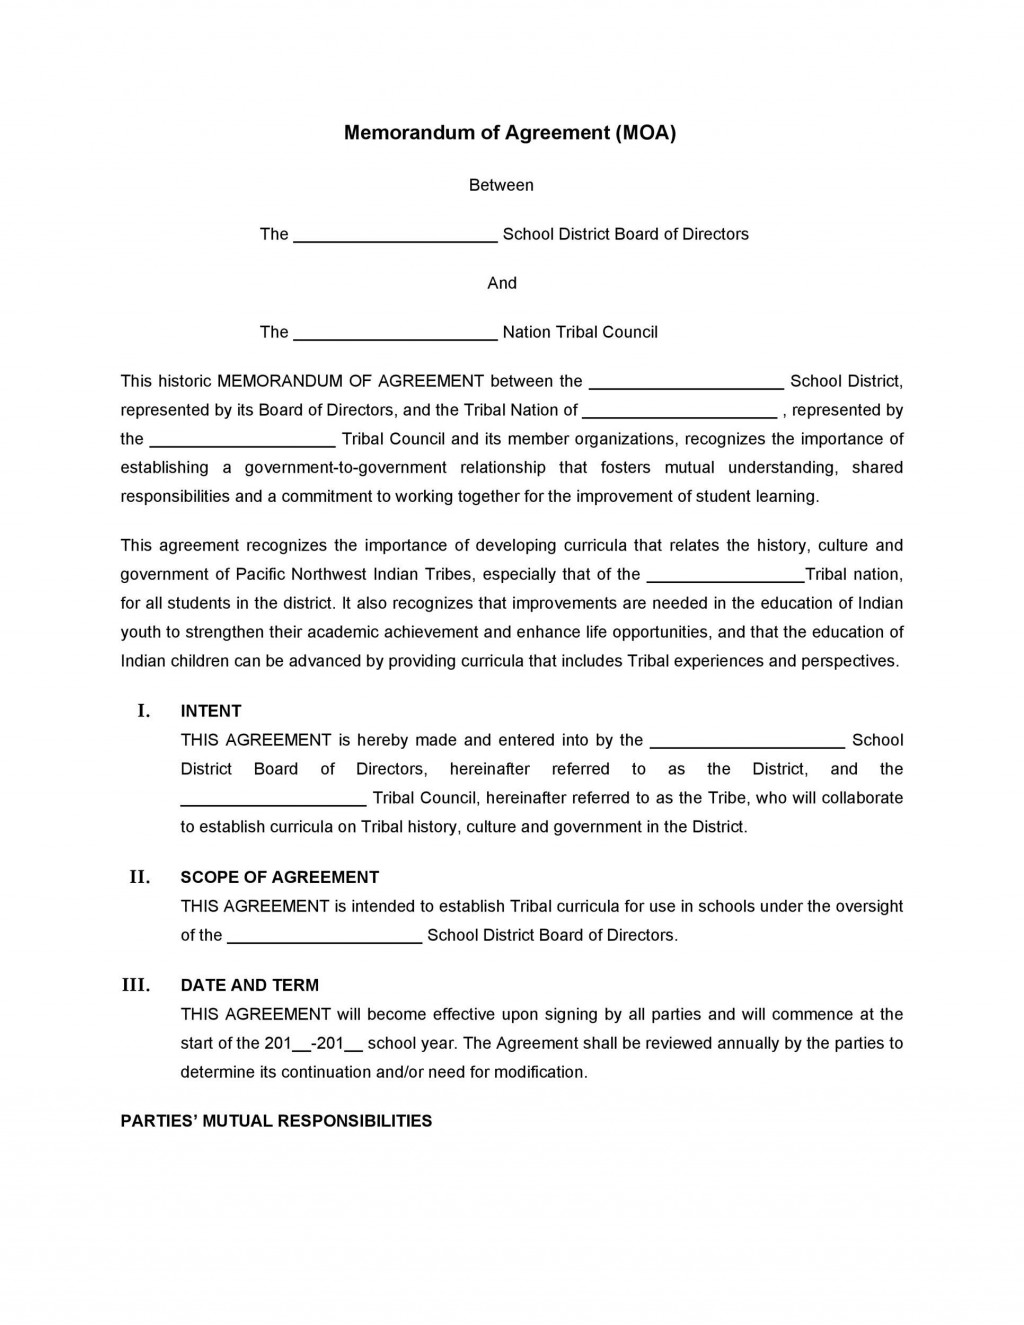 000 Phenomenal Private Placement Memorandum Outline High Resolution  Template Offering Sample FilmLarge